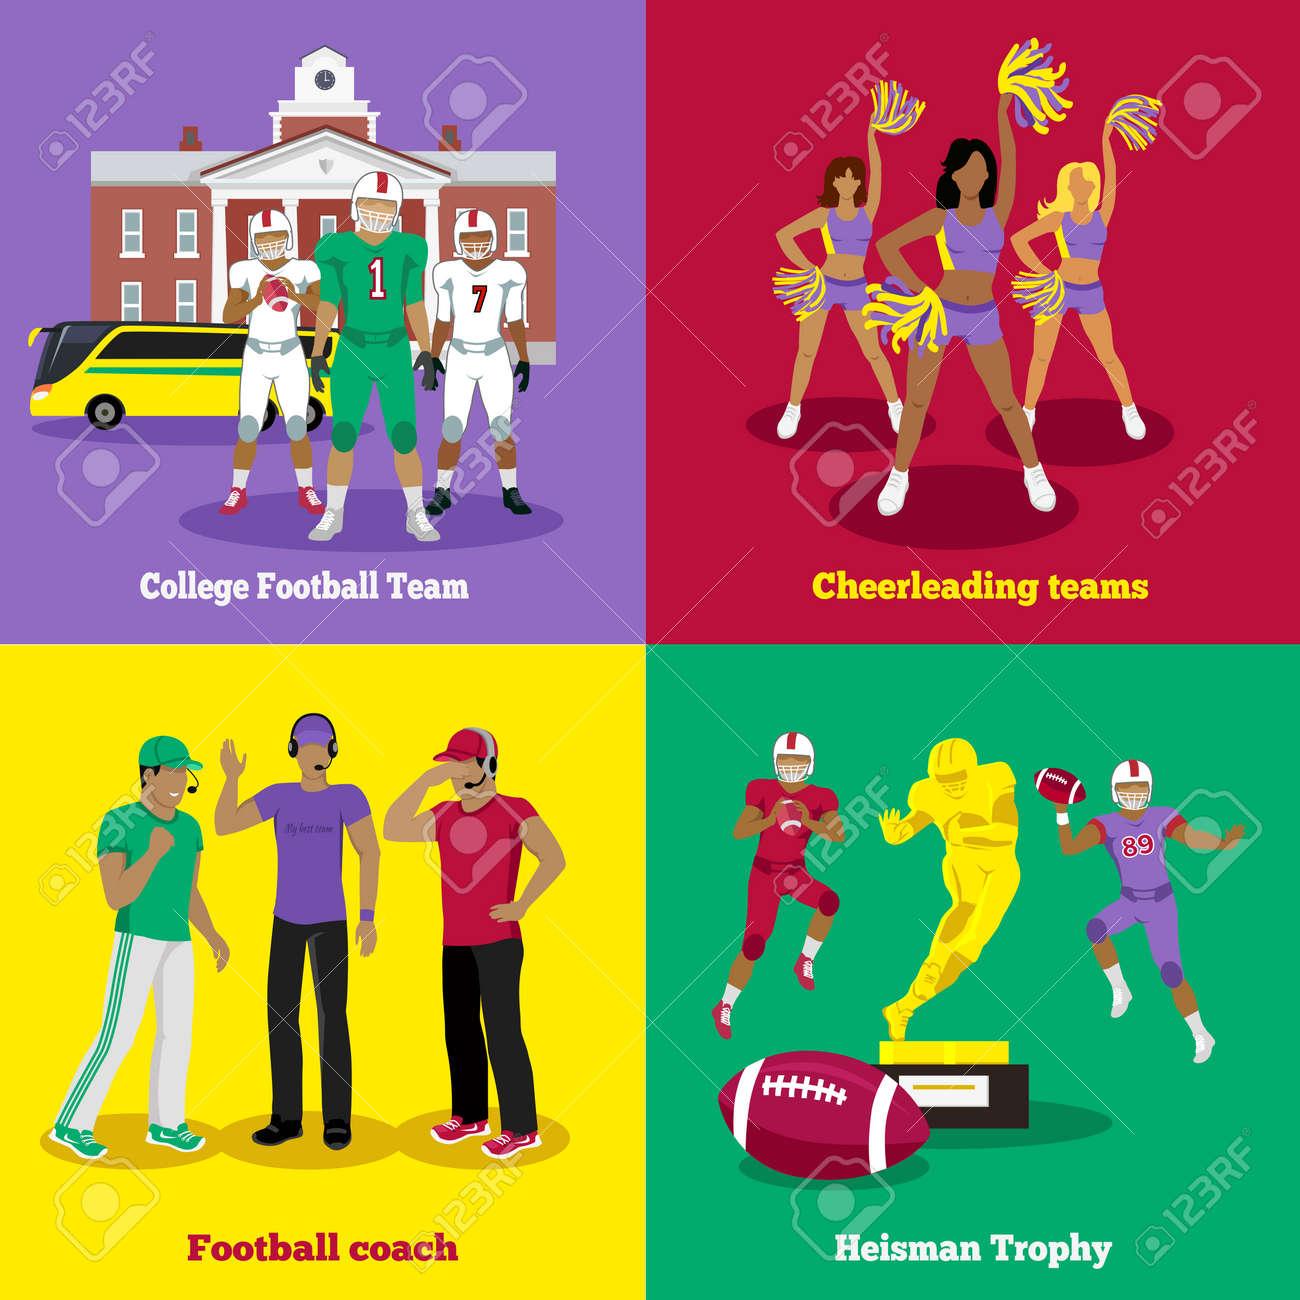 american football trophy football coach and team cheerleading